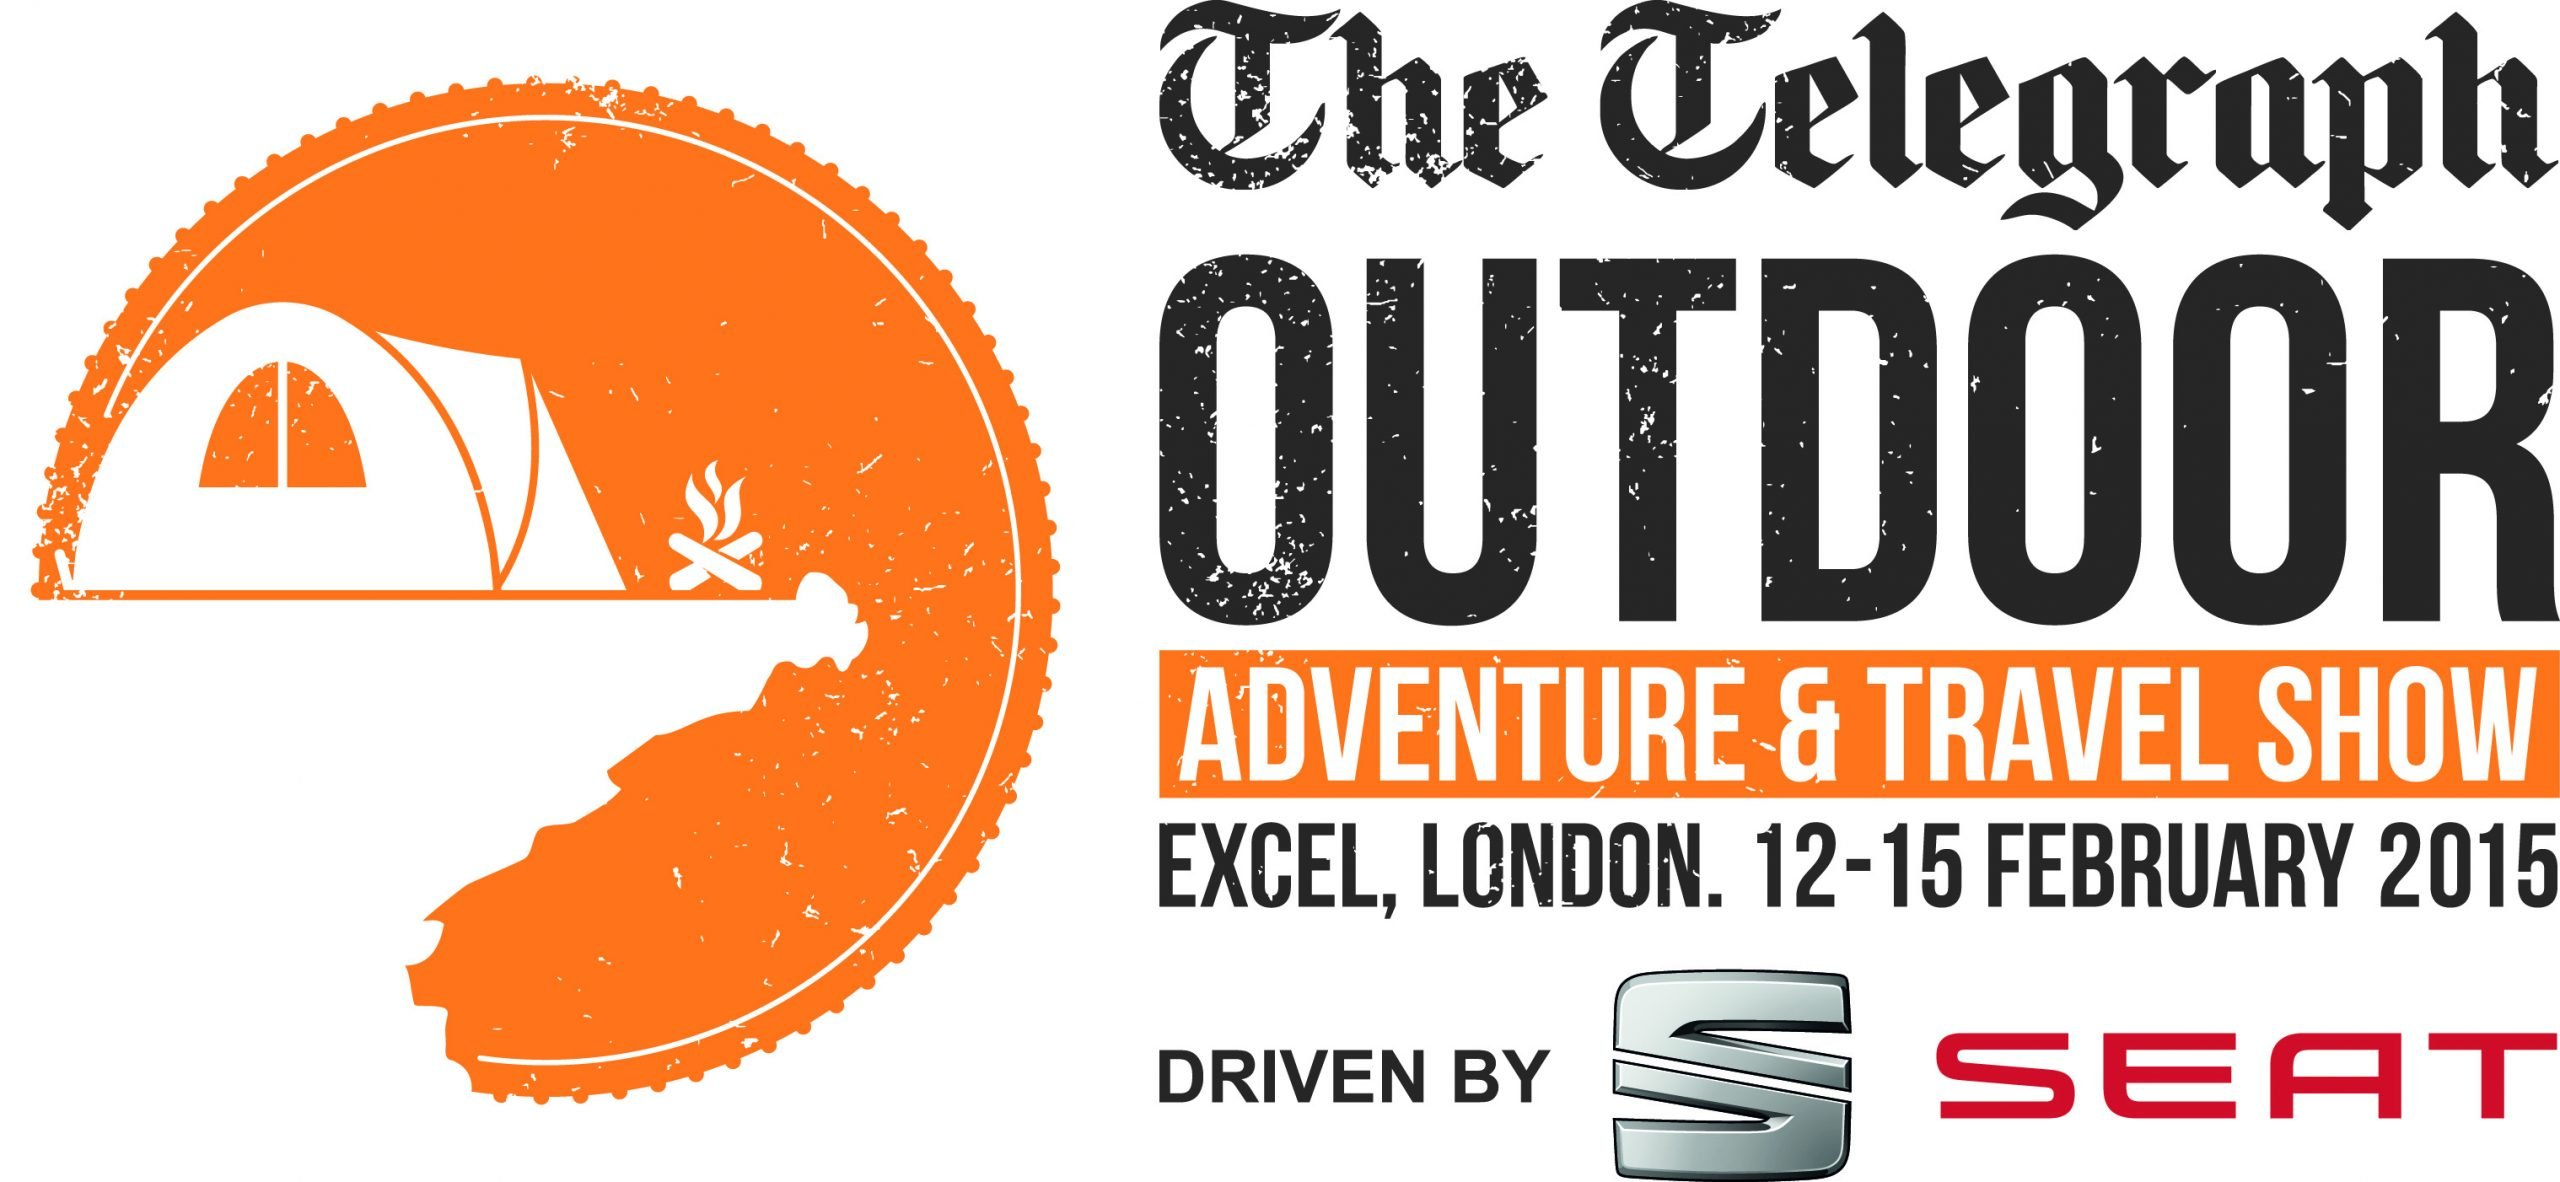 Telegraph Outdoor Adventure & Travel Show Show Logo